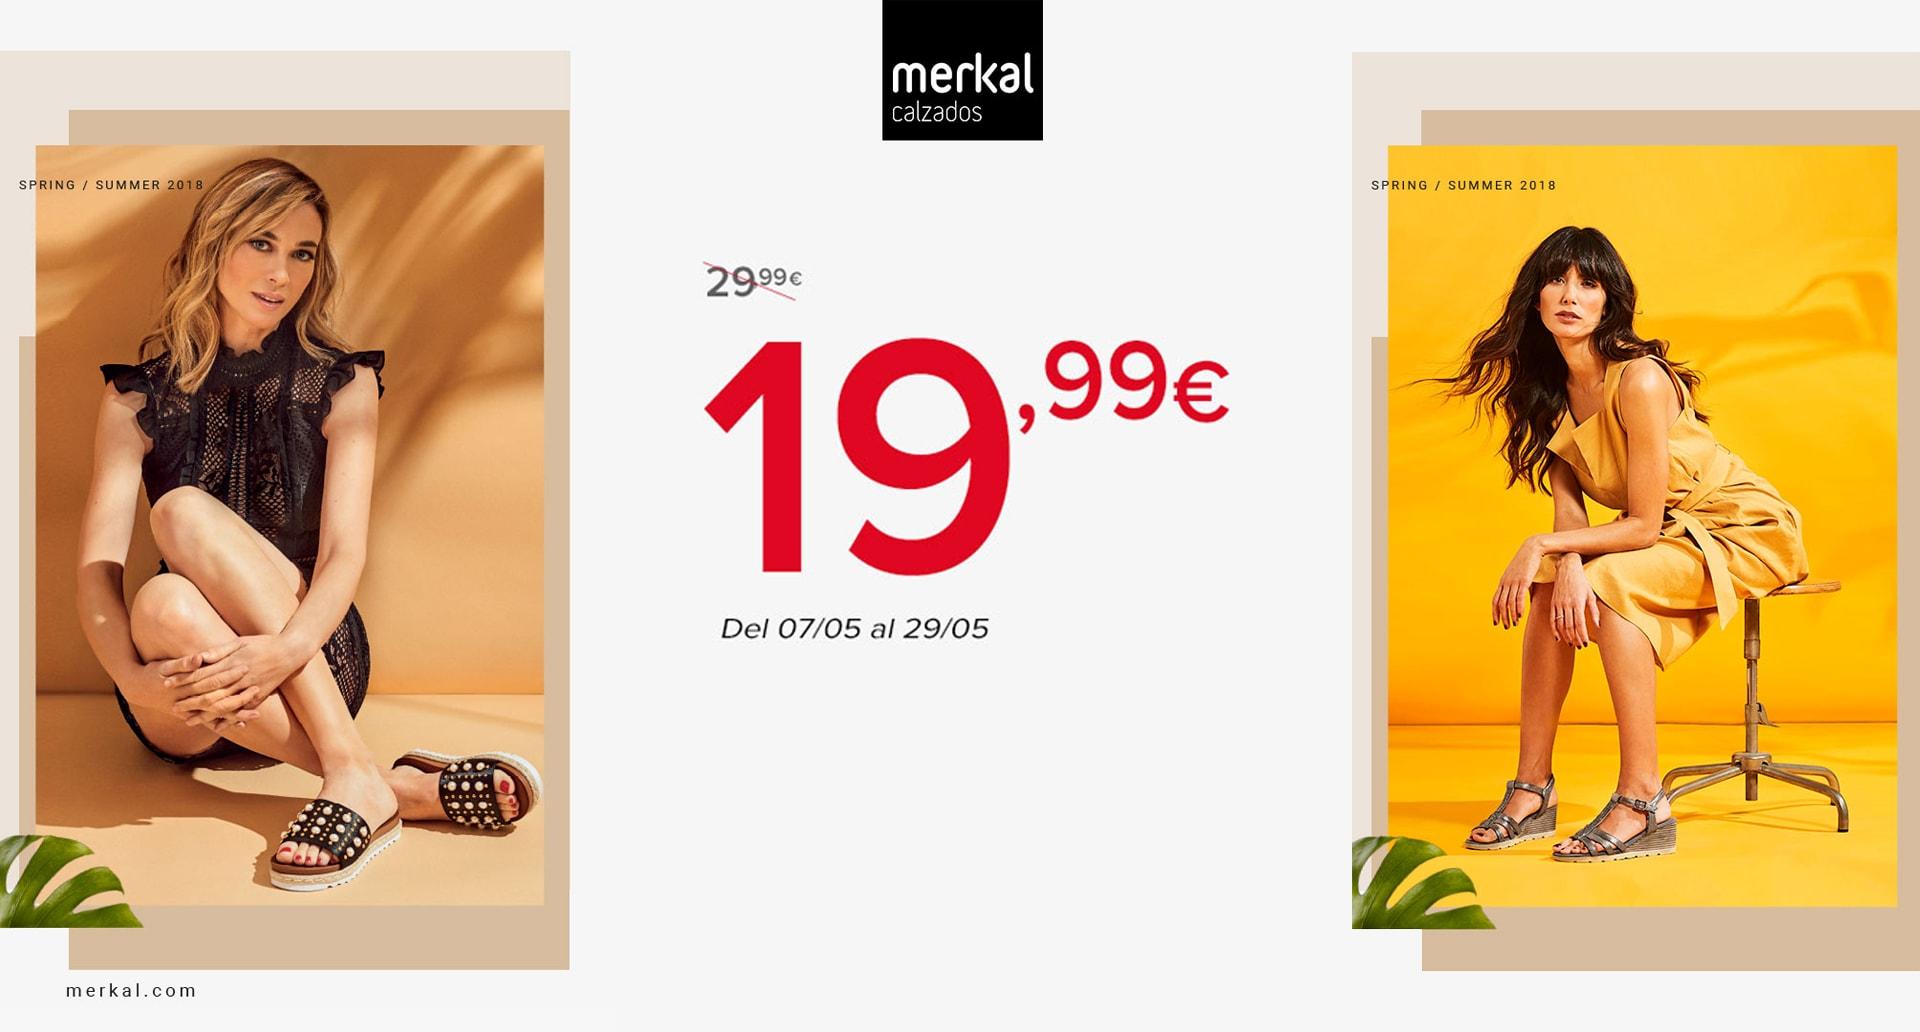 Merkal Calzados: Spring/Summer 2018